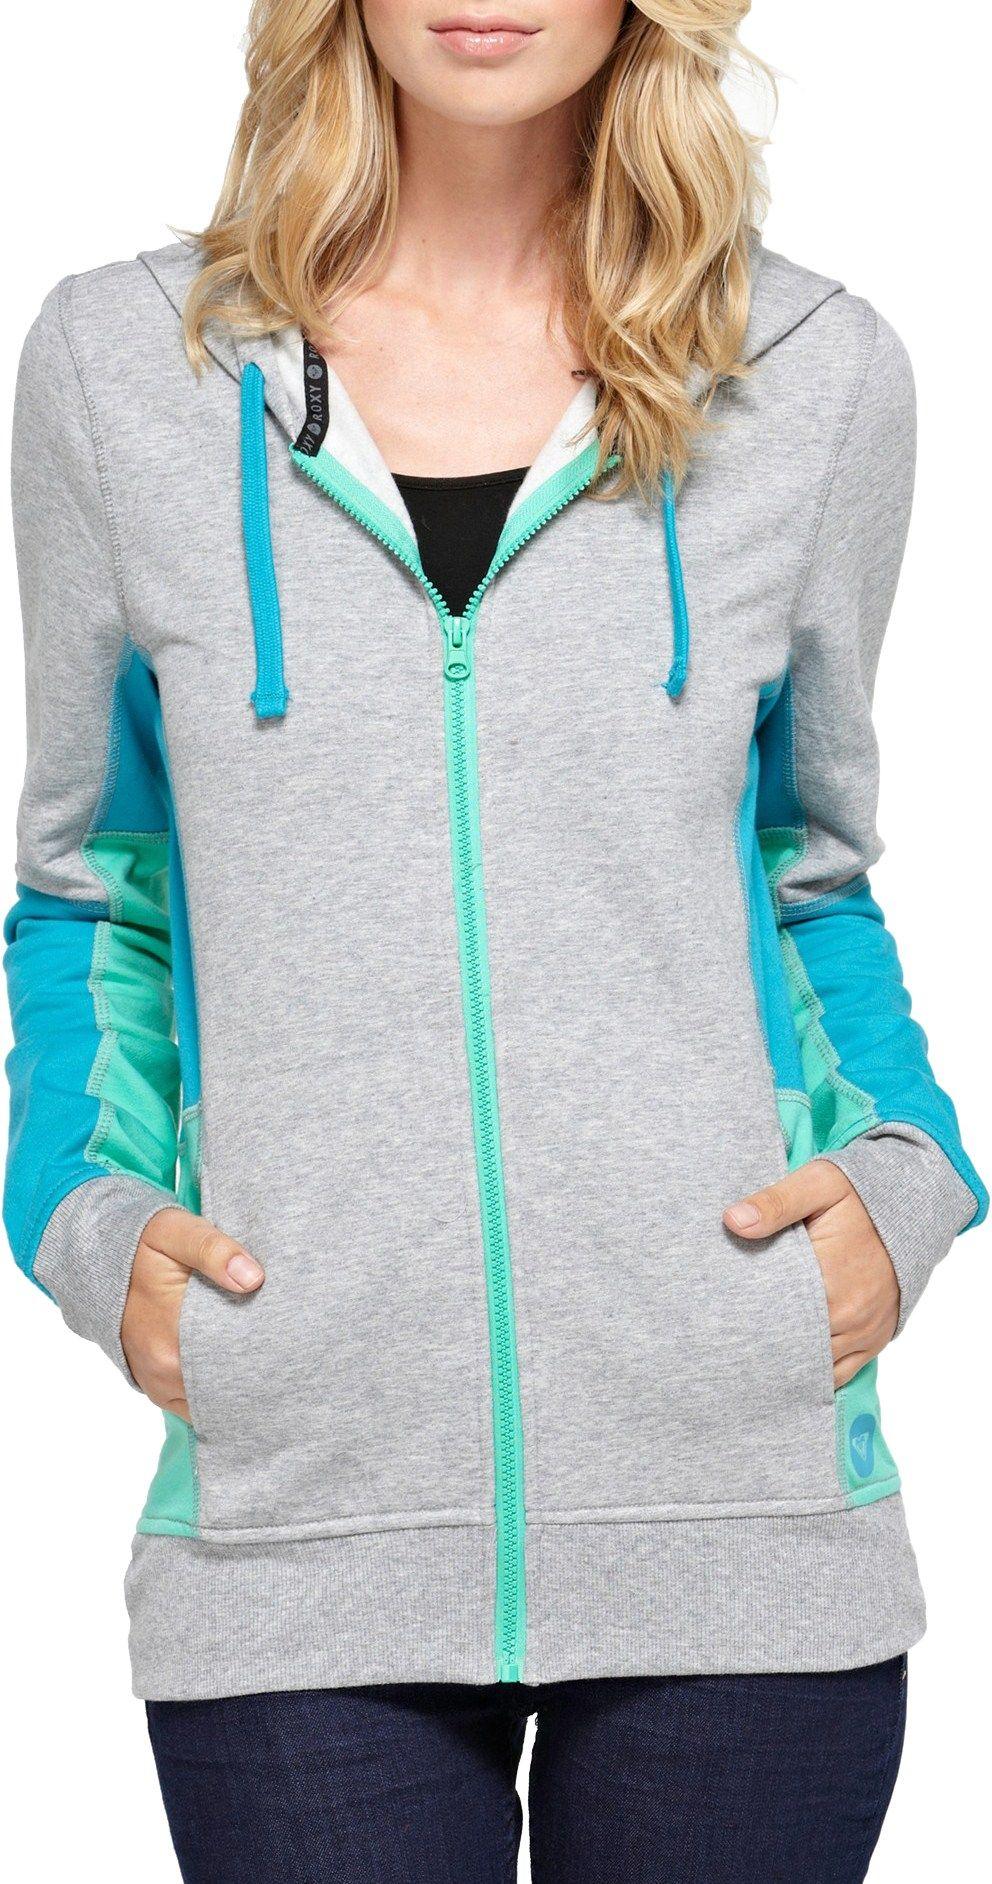 Roxy hoodie, Gray&Blue